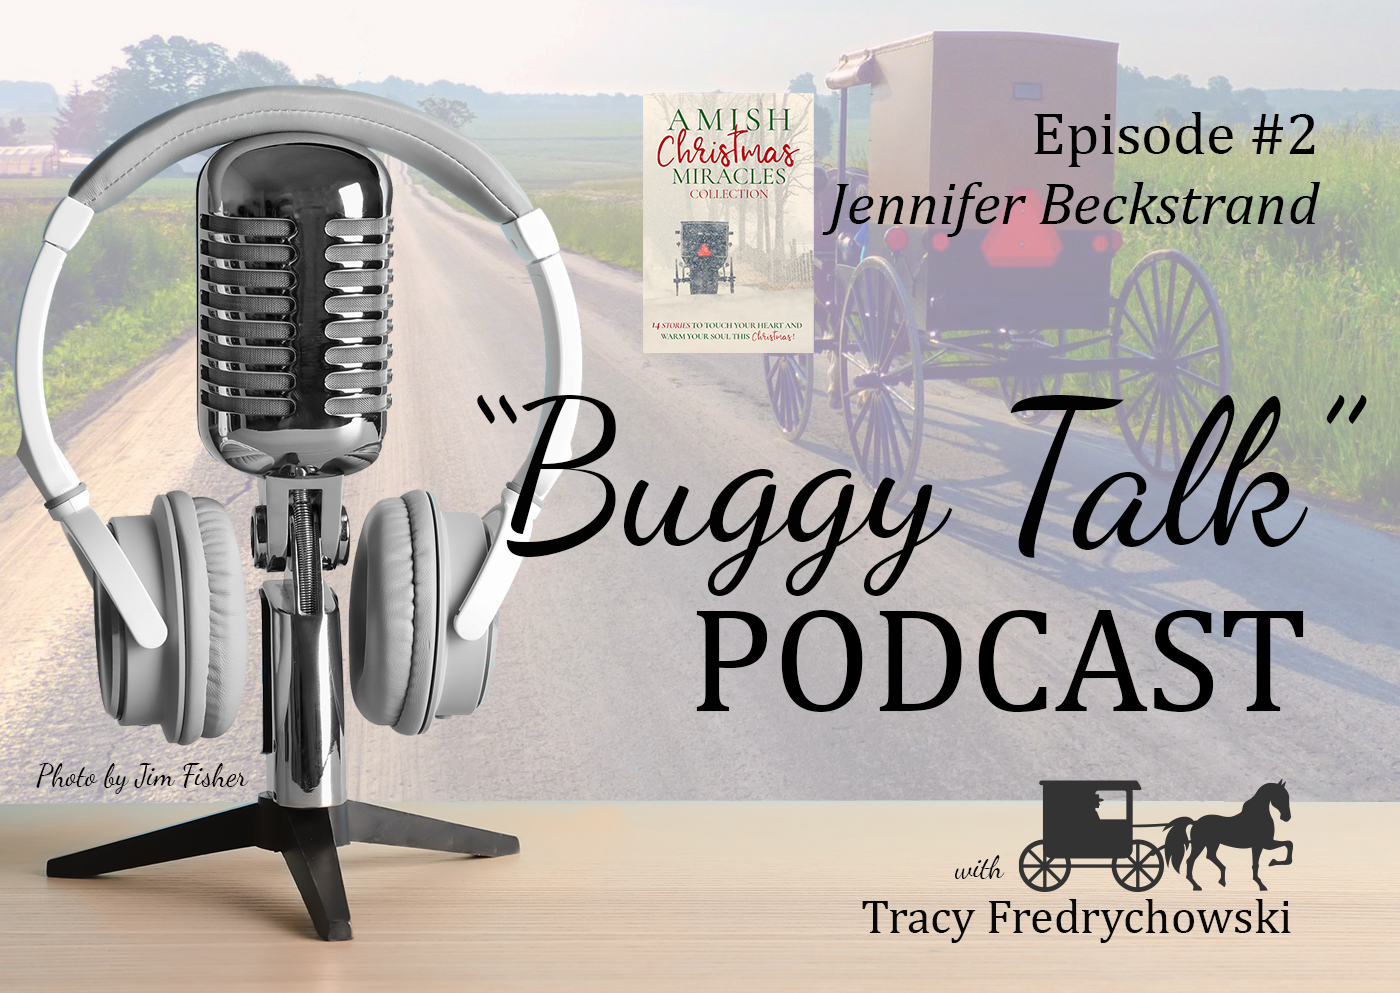 Episode #2 Jennifer Beckstrand